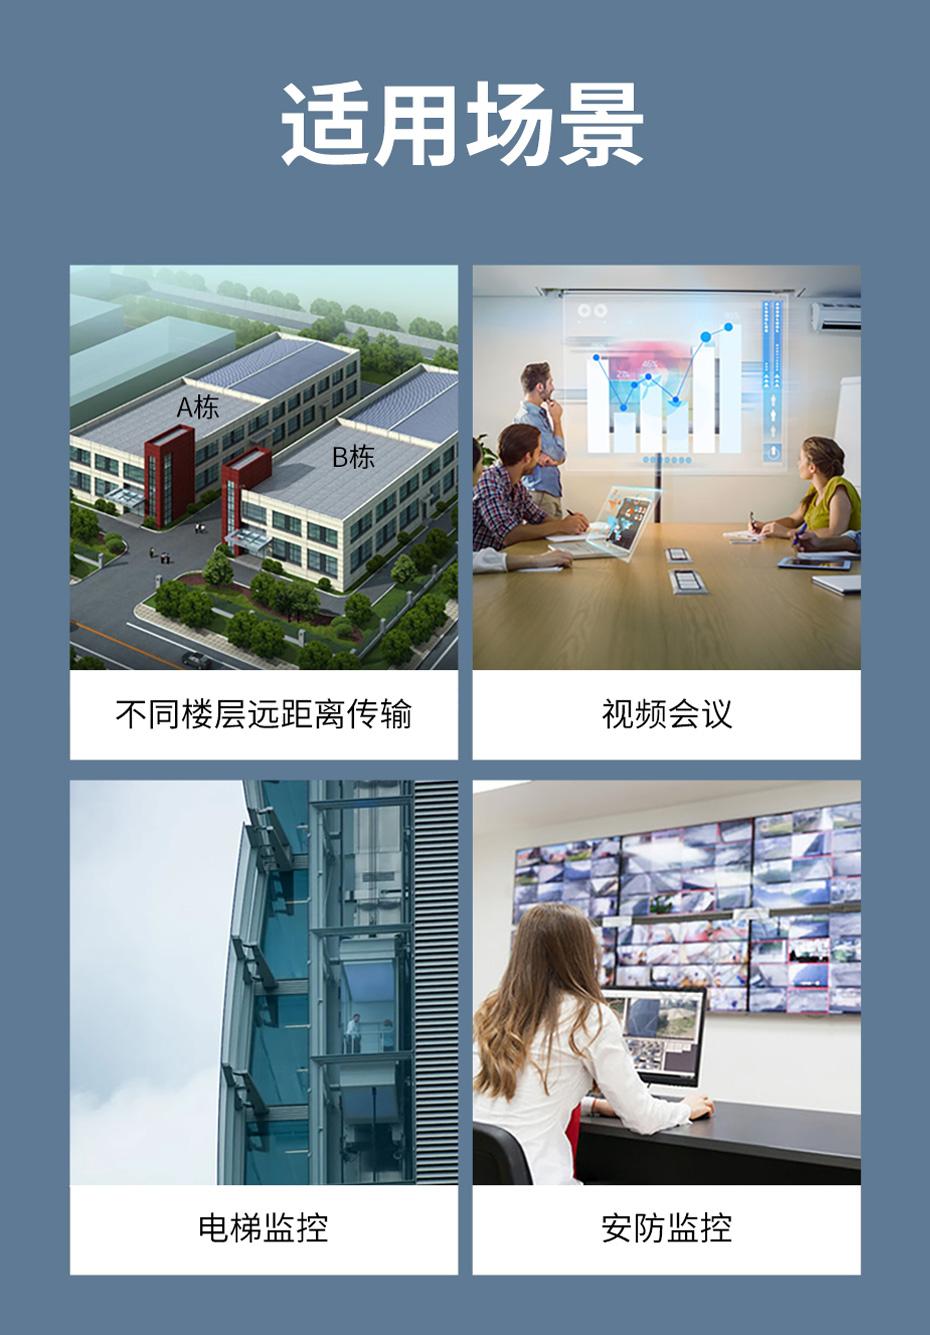 IP高清网络同轴传输器NCR200使用独立电源+地线设计